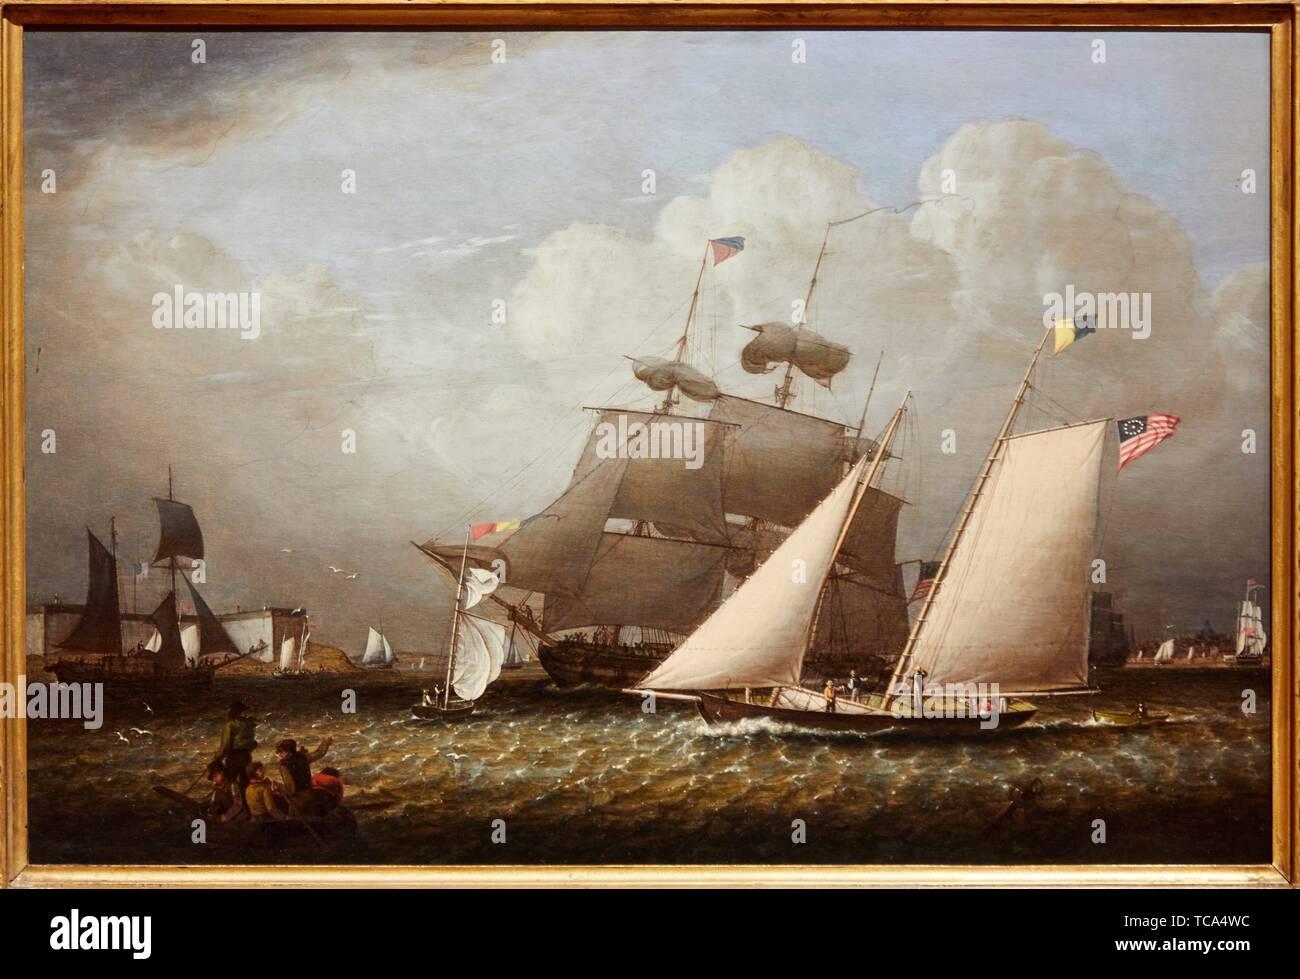 '''Imagen del sueño de yates de placer'', de 1839, Robert Salmón, Museo Thyssen Bornemisza, Madrid, España Imagen De Stock